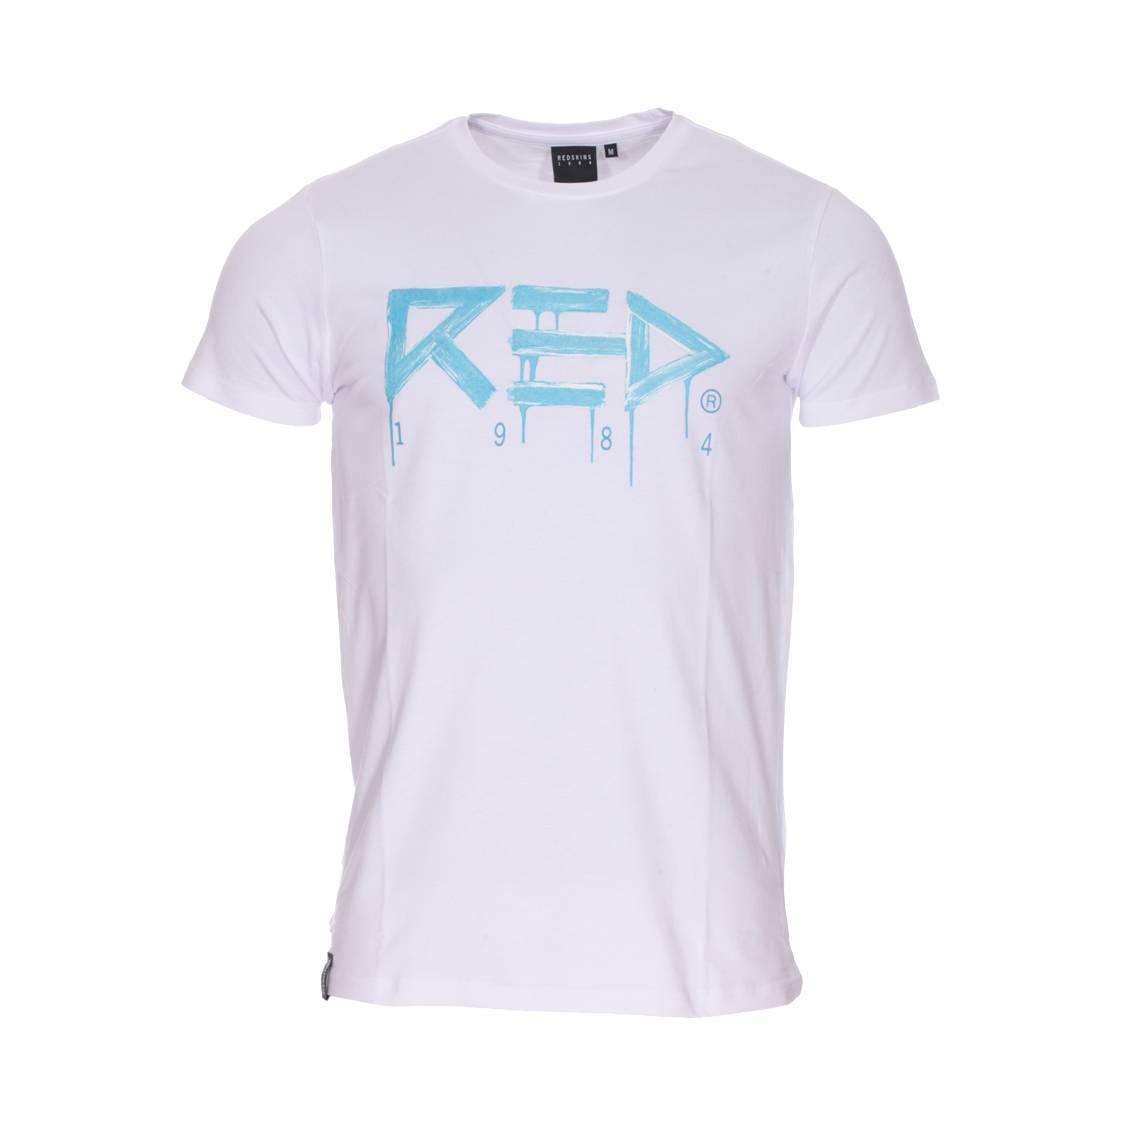 Tee-shirt col rond  undefeated en coton stretch blanc floqué en bleu